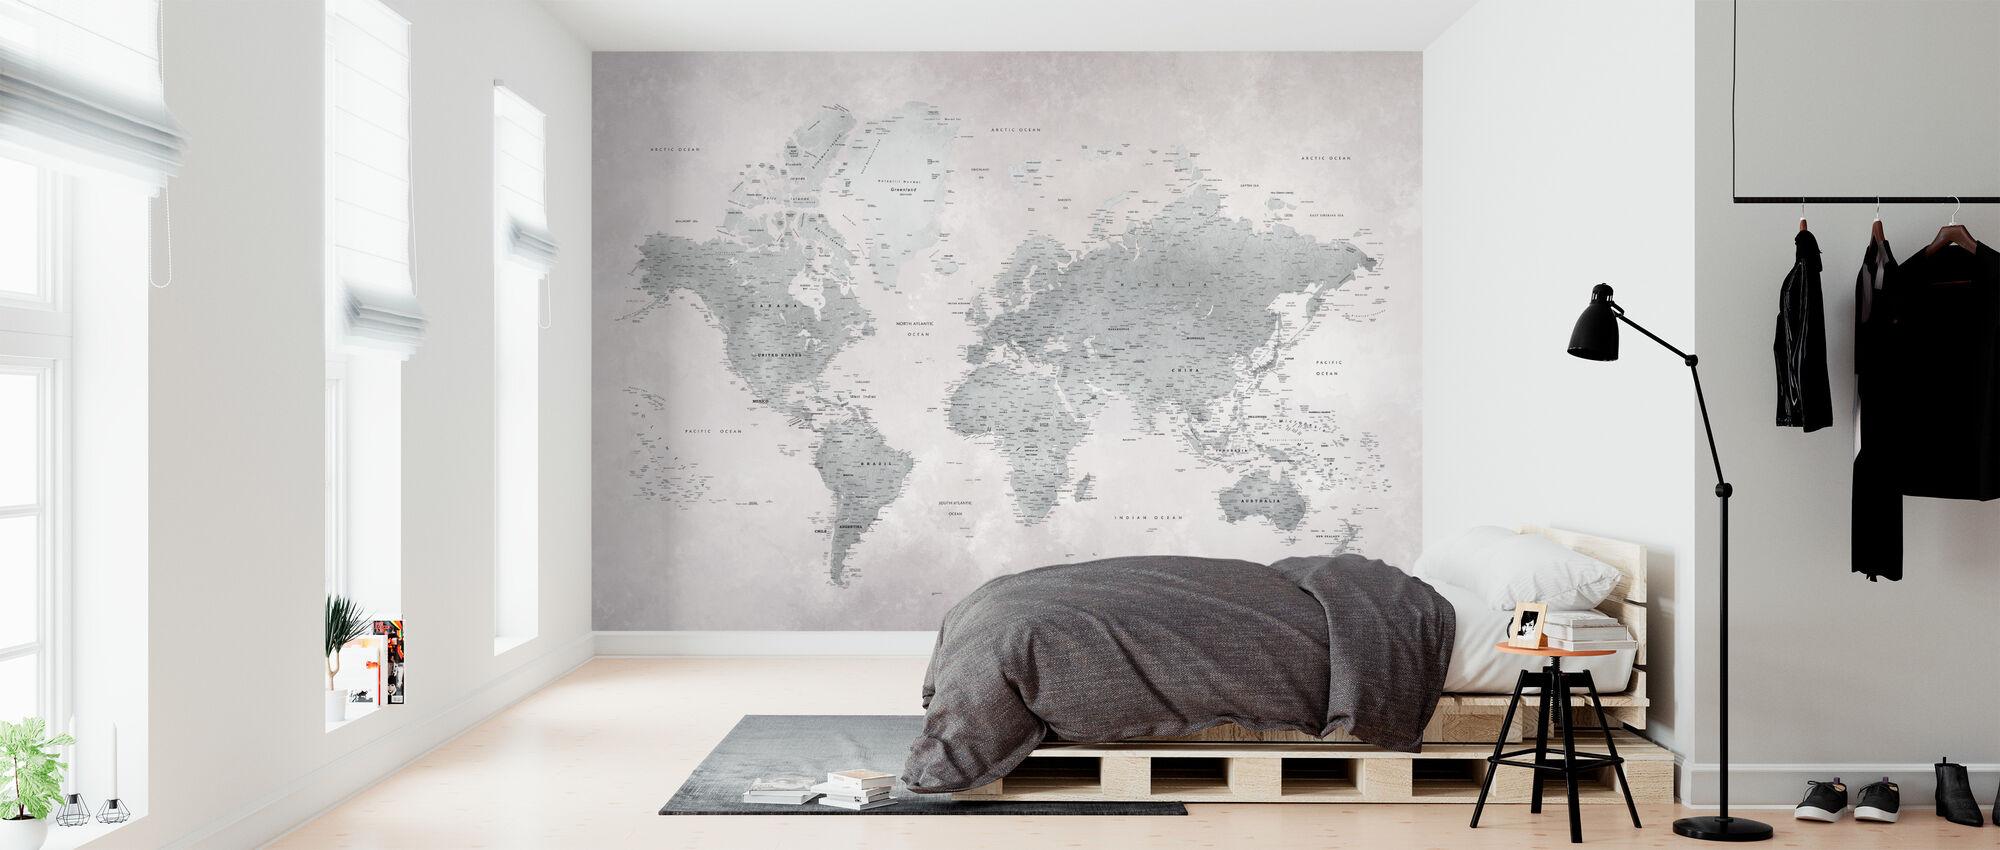 World Map - Ash-Green - Wallpaper - Bedroom